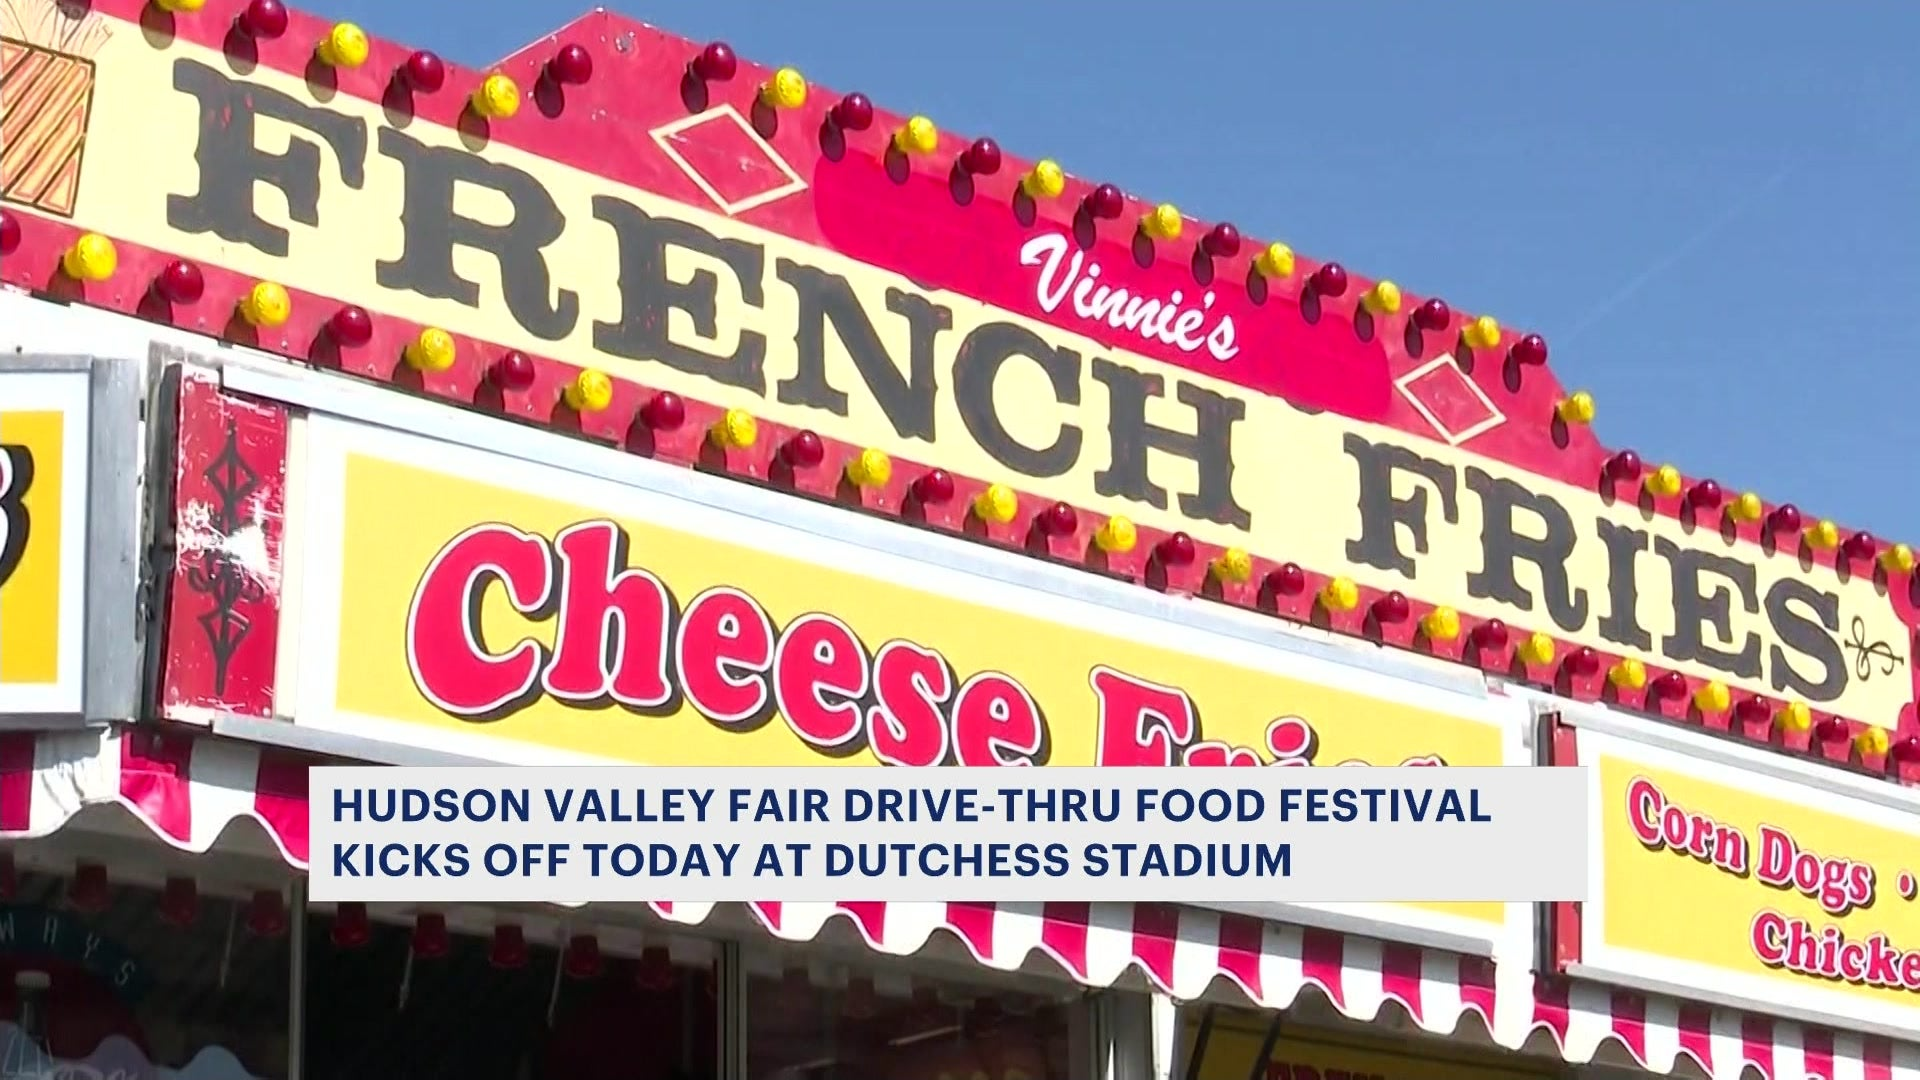 Hudson Valley Fair Food Drive Thru Adapts To Pandemic